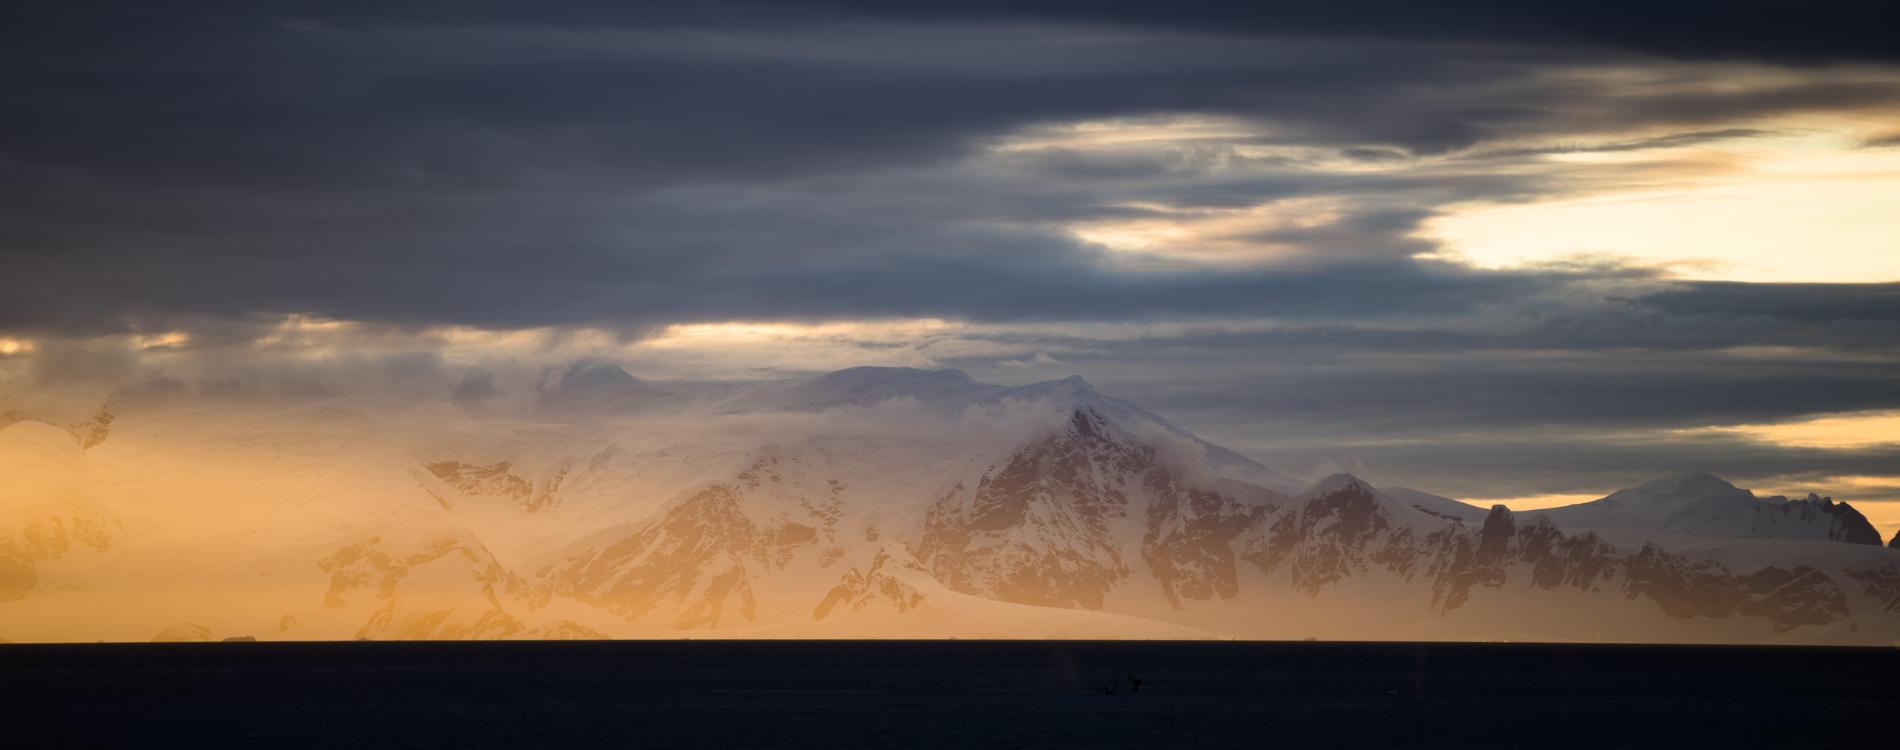 Antarctica sunset and mountains